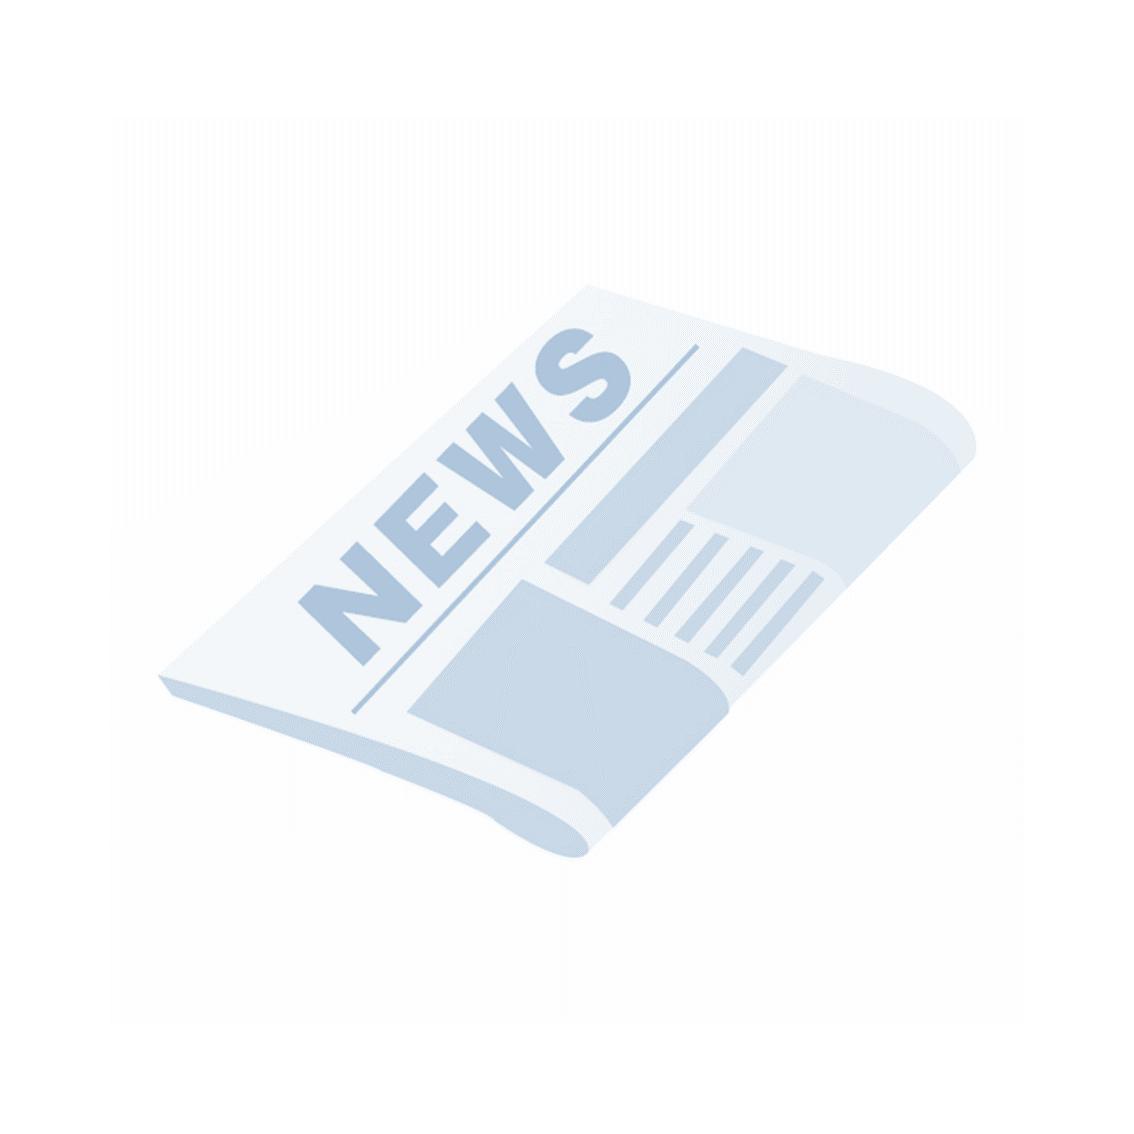 "THE SANKEI NEWS 産経新聞 2020.01.29(WED) / ""安全性""の国際基準「エコテックス®スタンダード100」の認証スーツを発売"